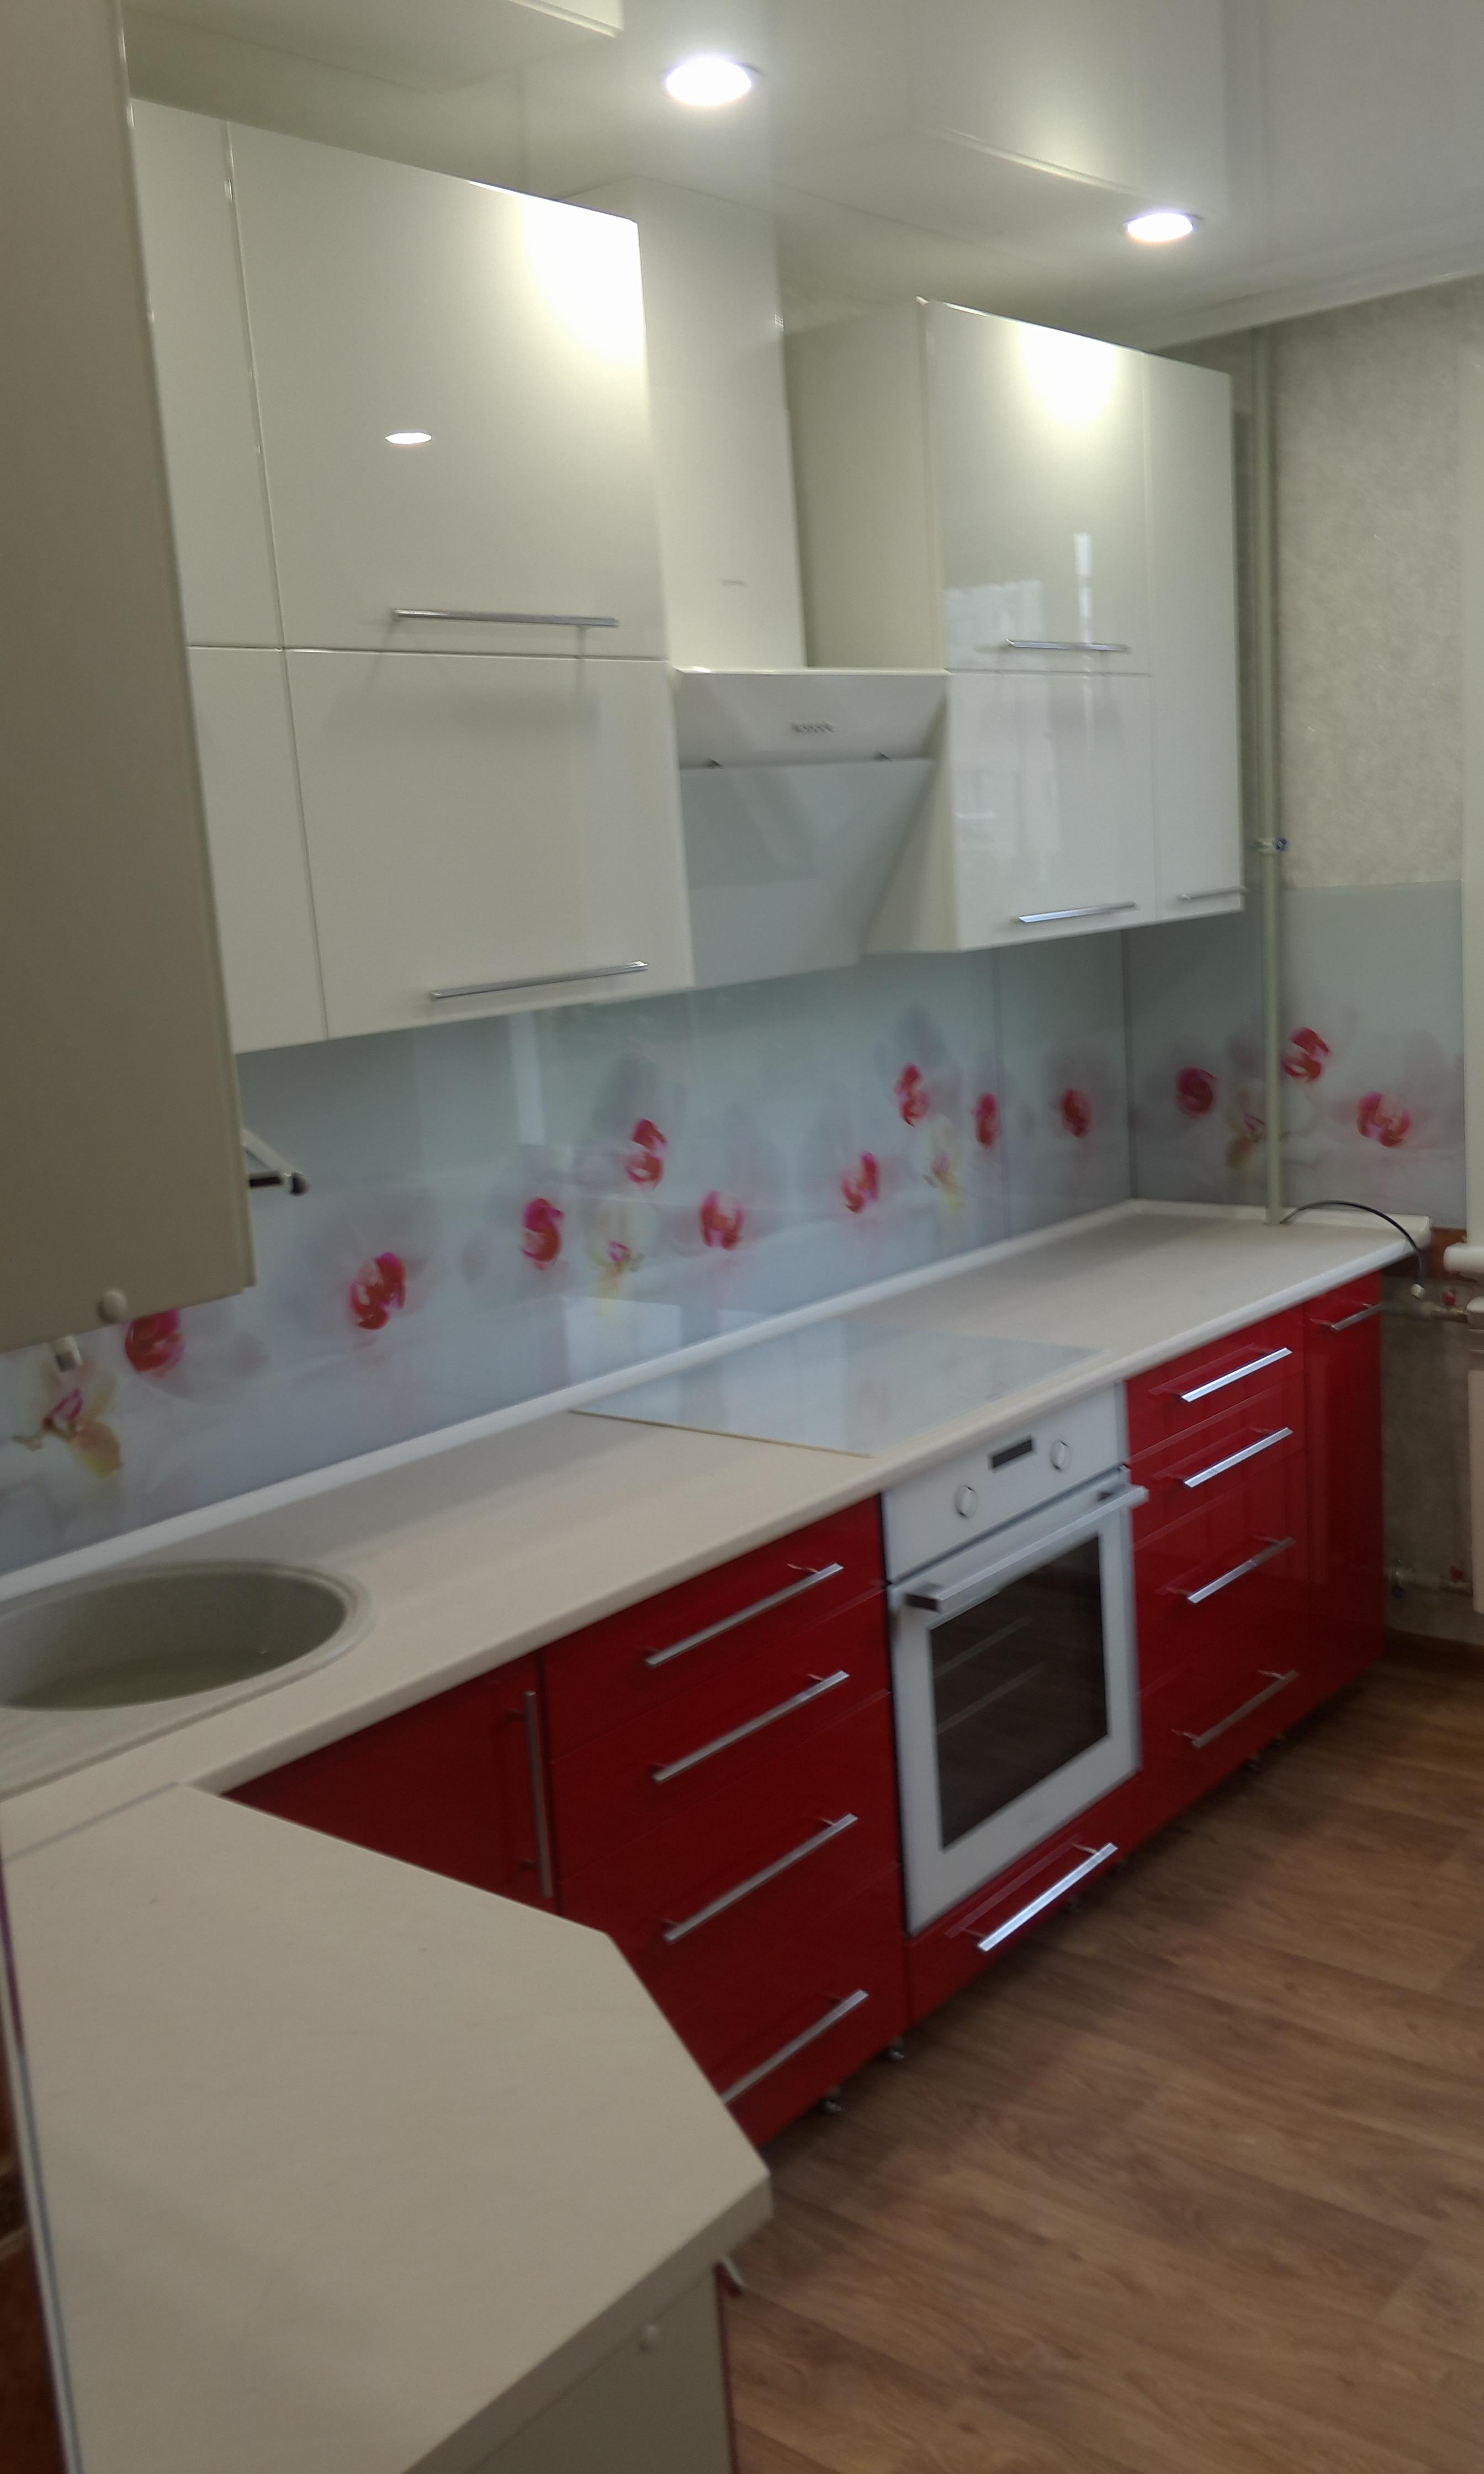 Фото Изготовление мебели (кухни, шкаф-купе, ванная комната....) 1